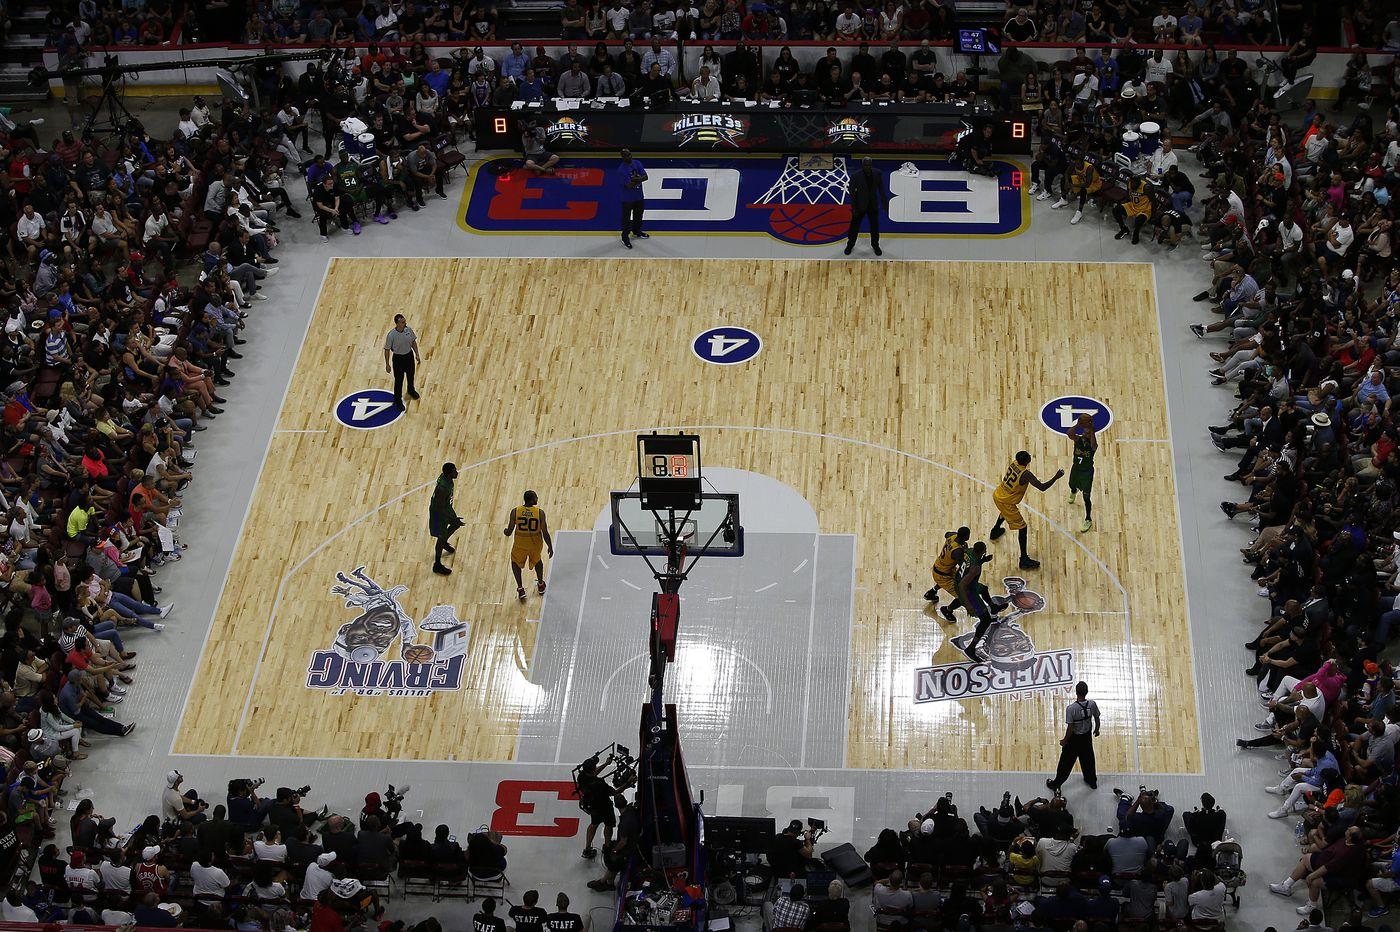 BIG3 basketball tour coming to Liacouras Center on June 30